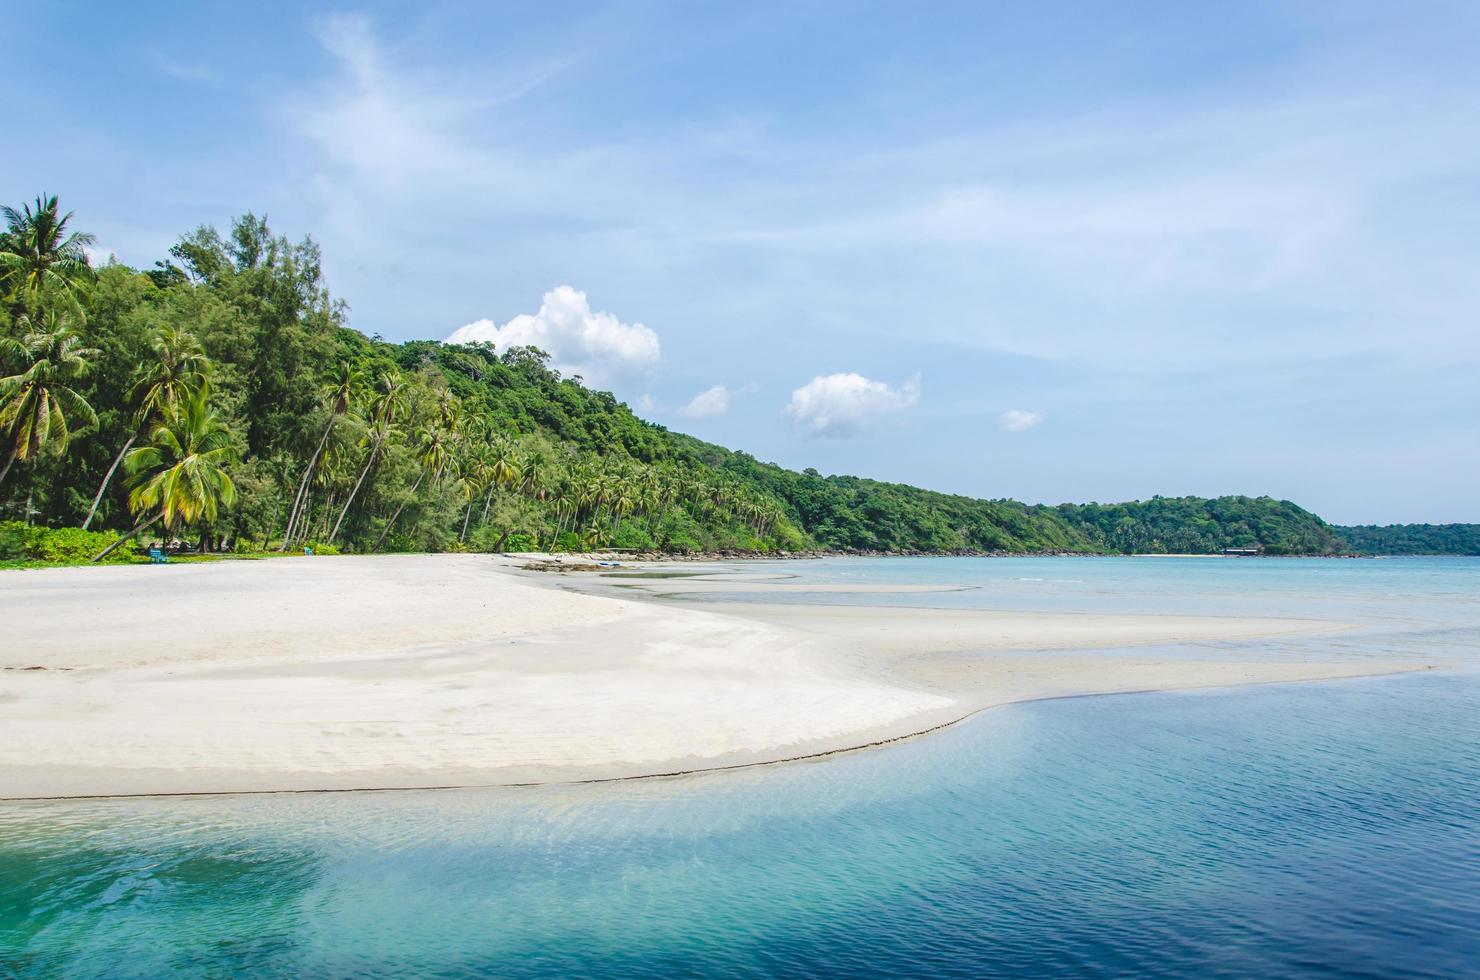 tom tropisk strand foto